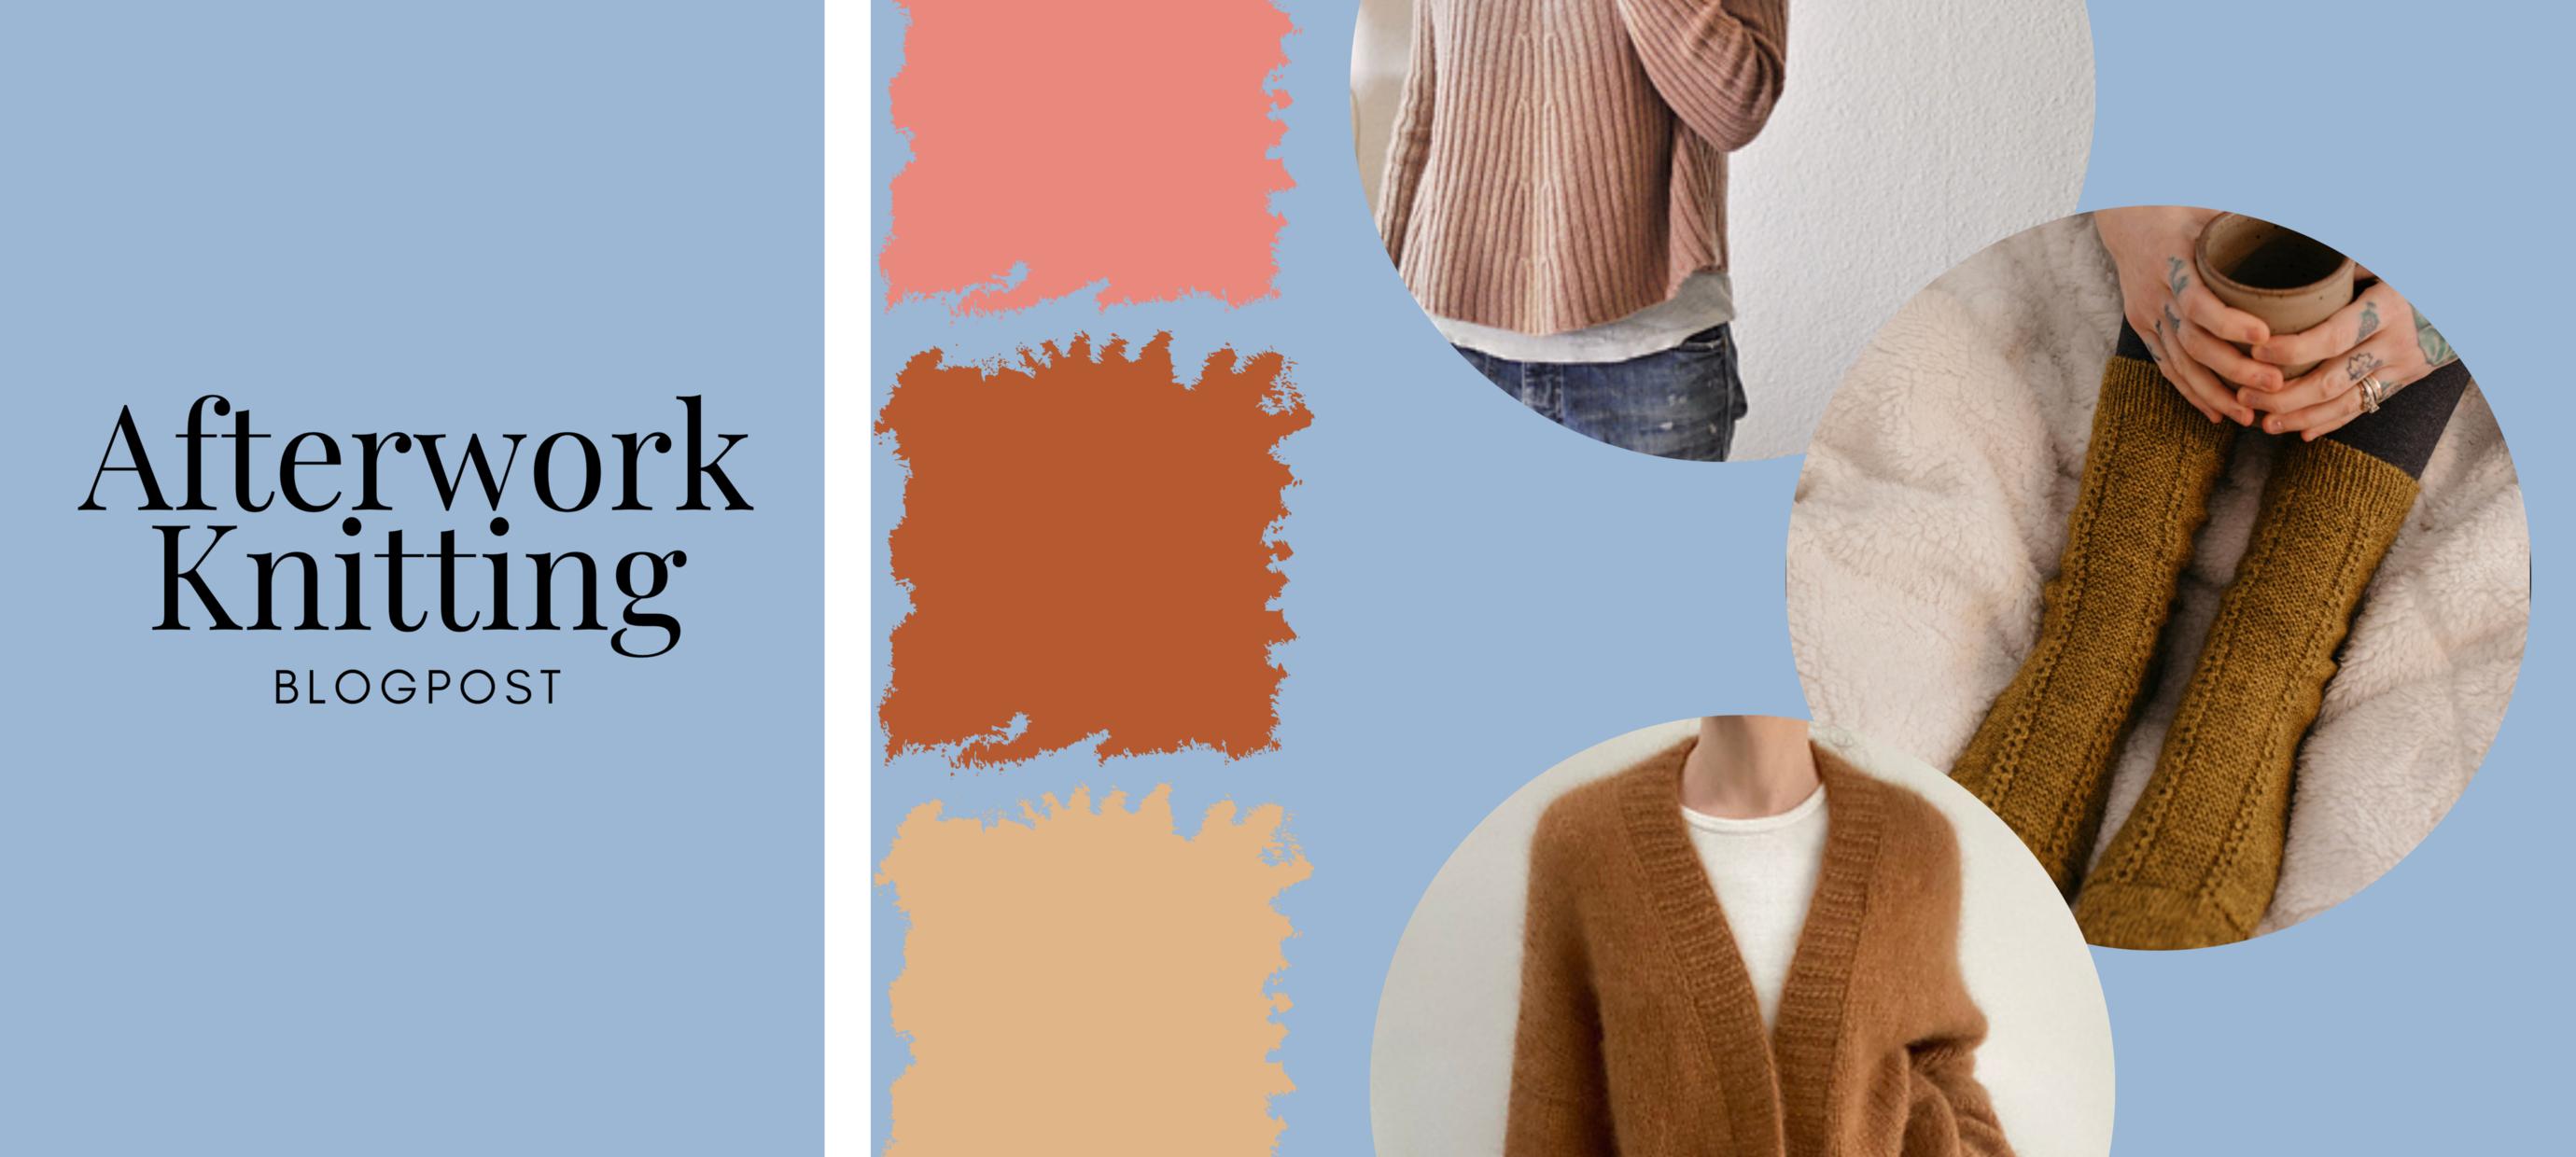 Afterwork-Knitting 11. Februar 2021